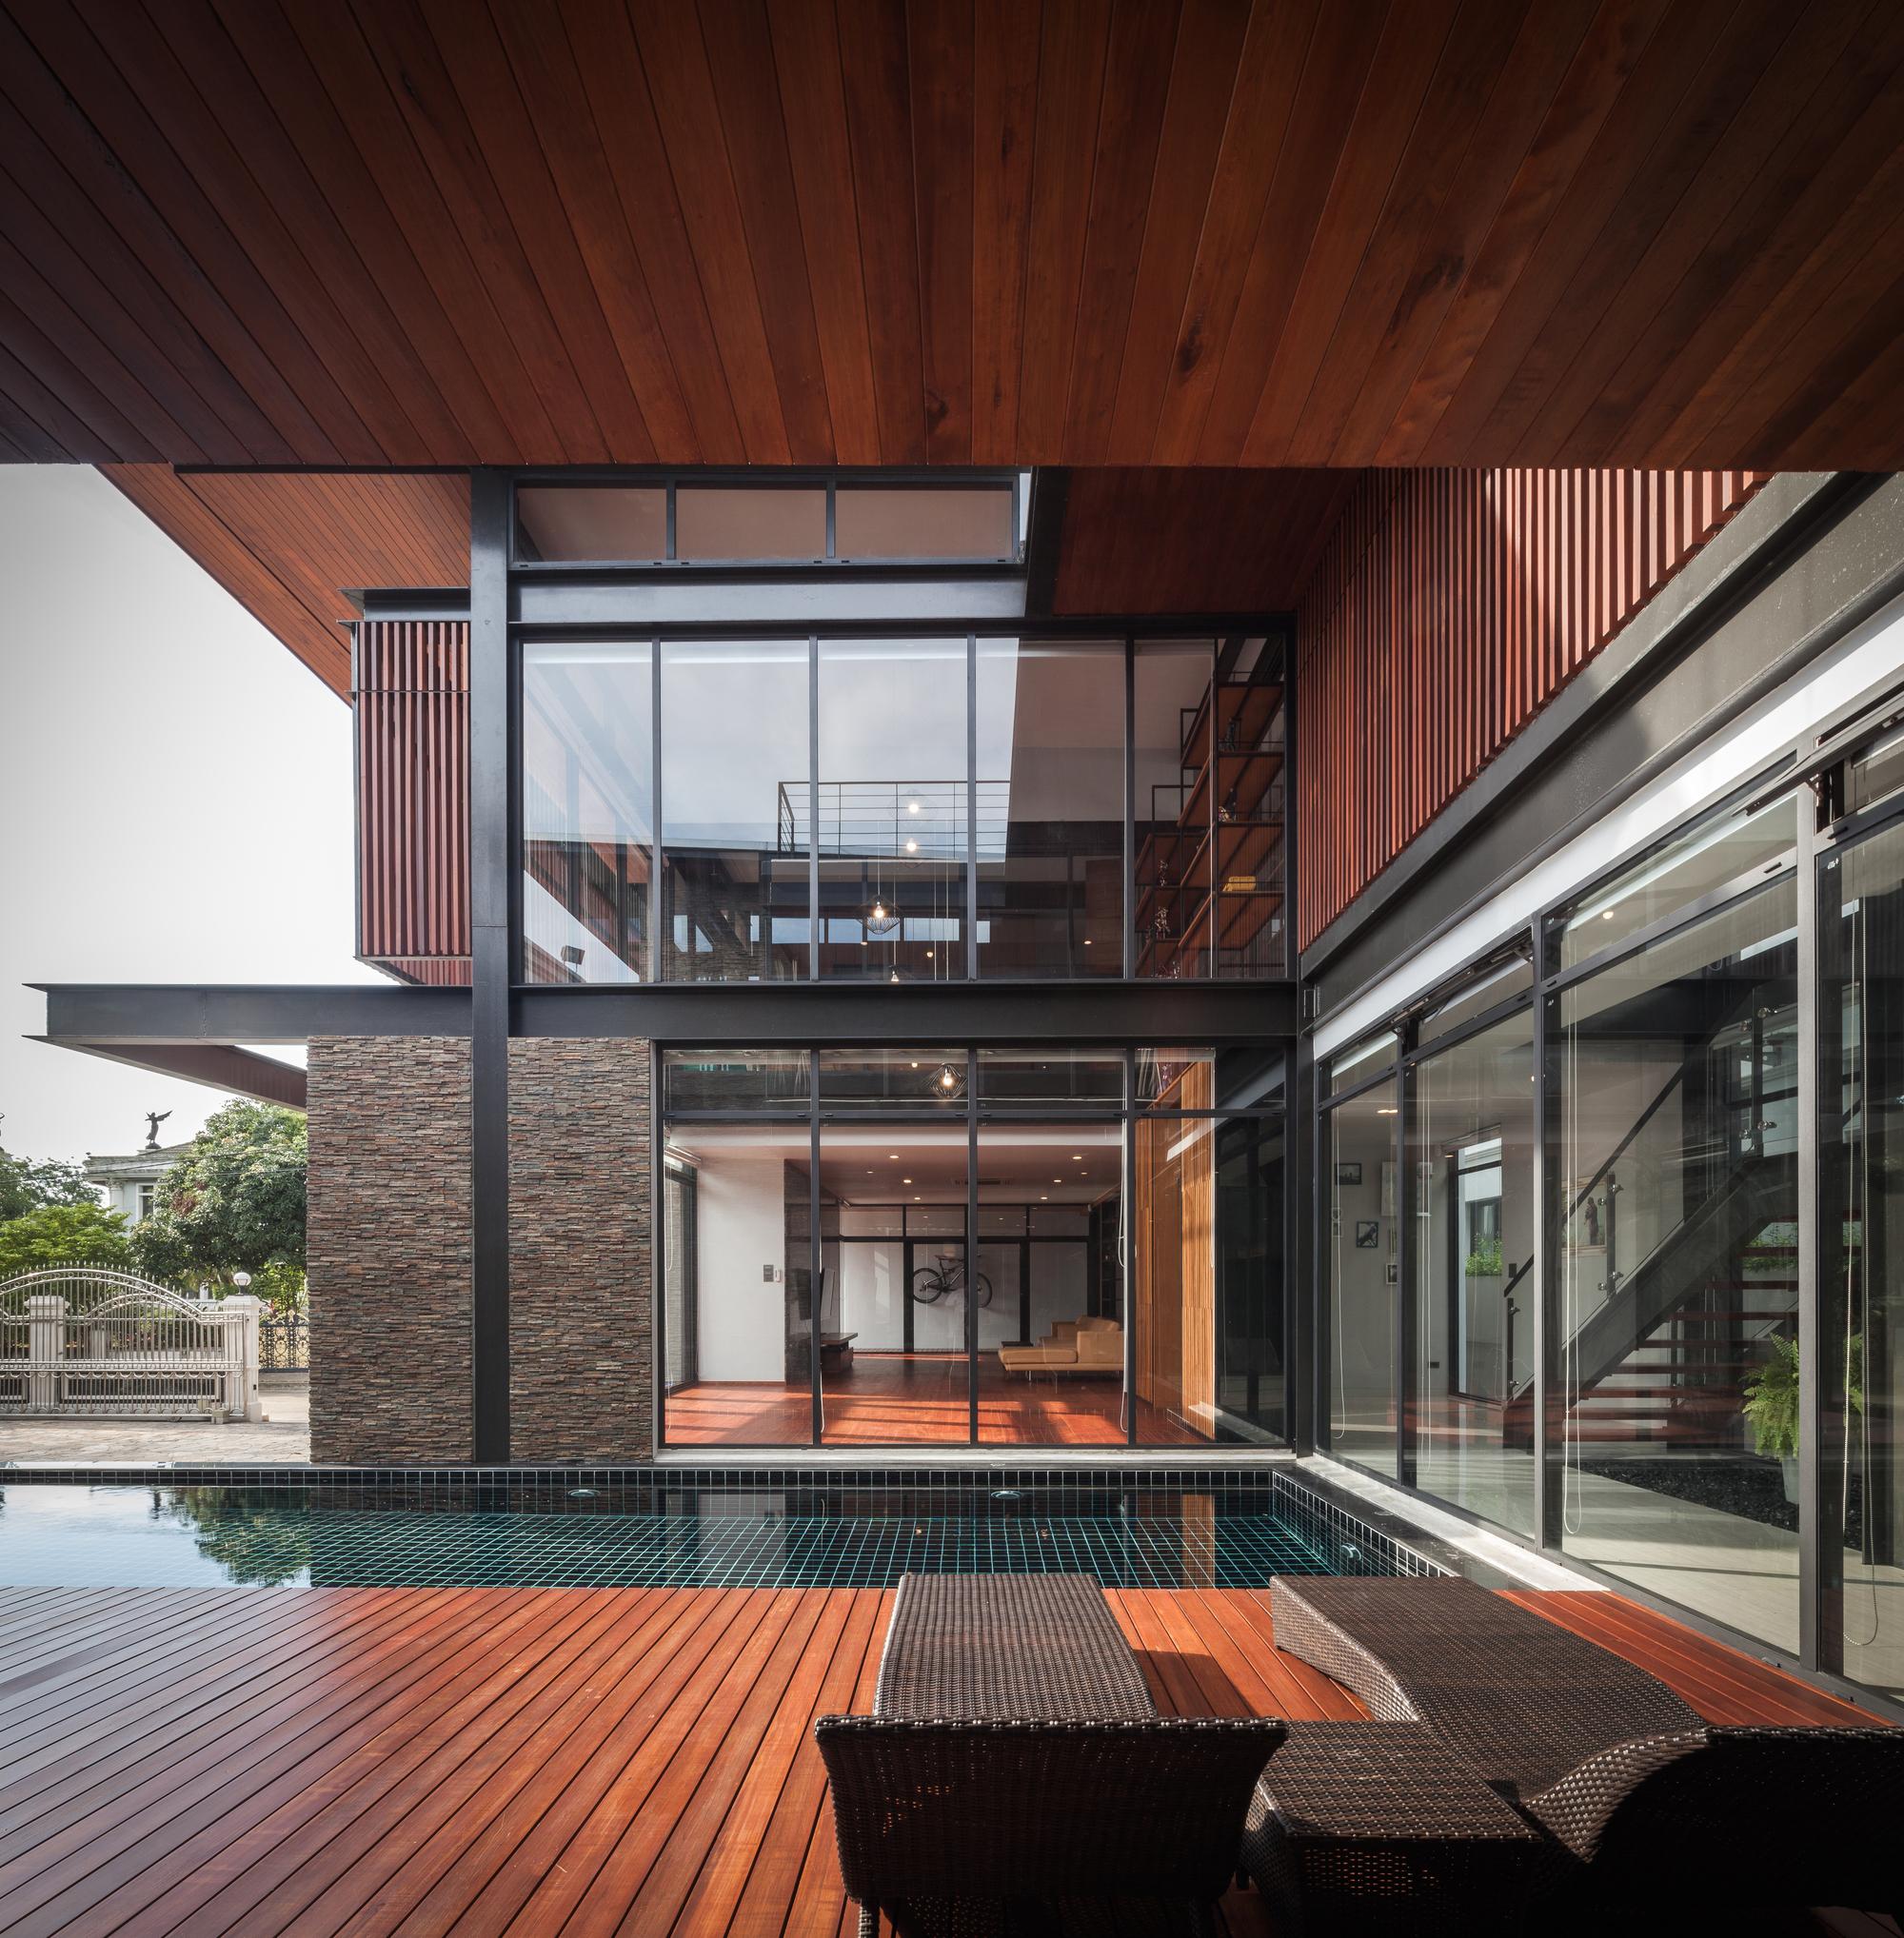 Gallery of Bridge House Junsekino Architect